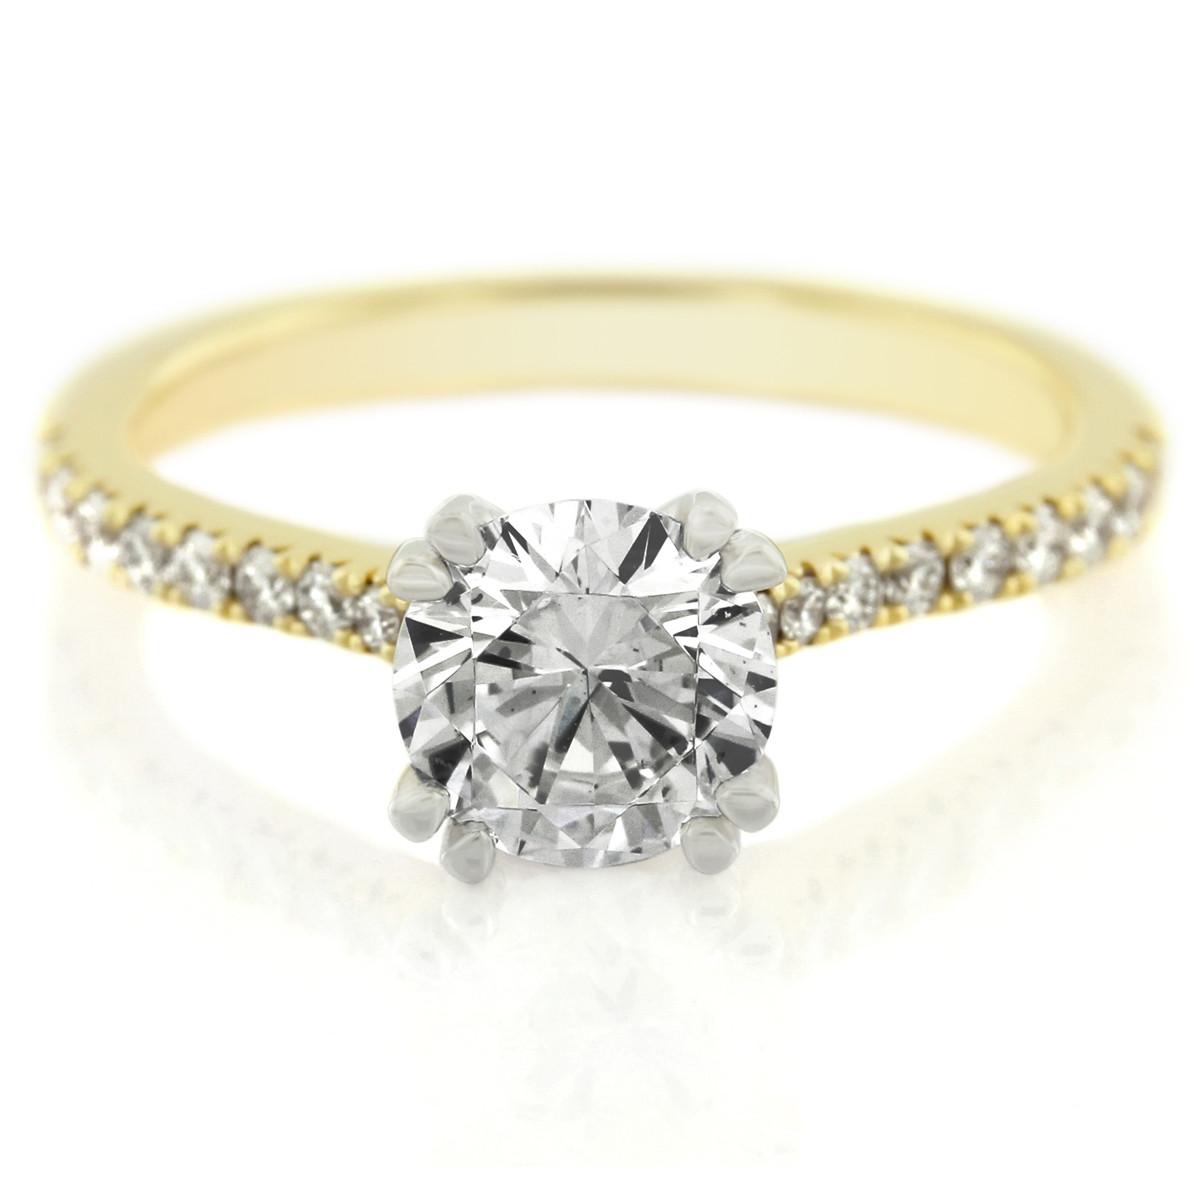 18K Yellow Gold Four Prong Diamond Engagement Ring